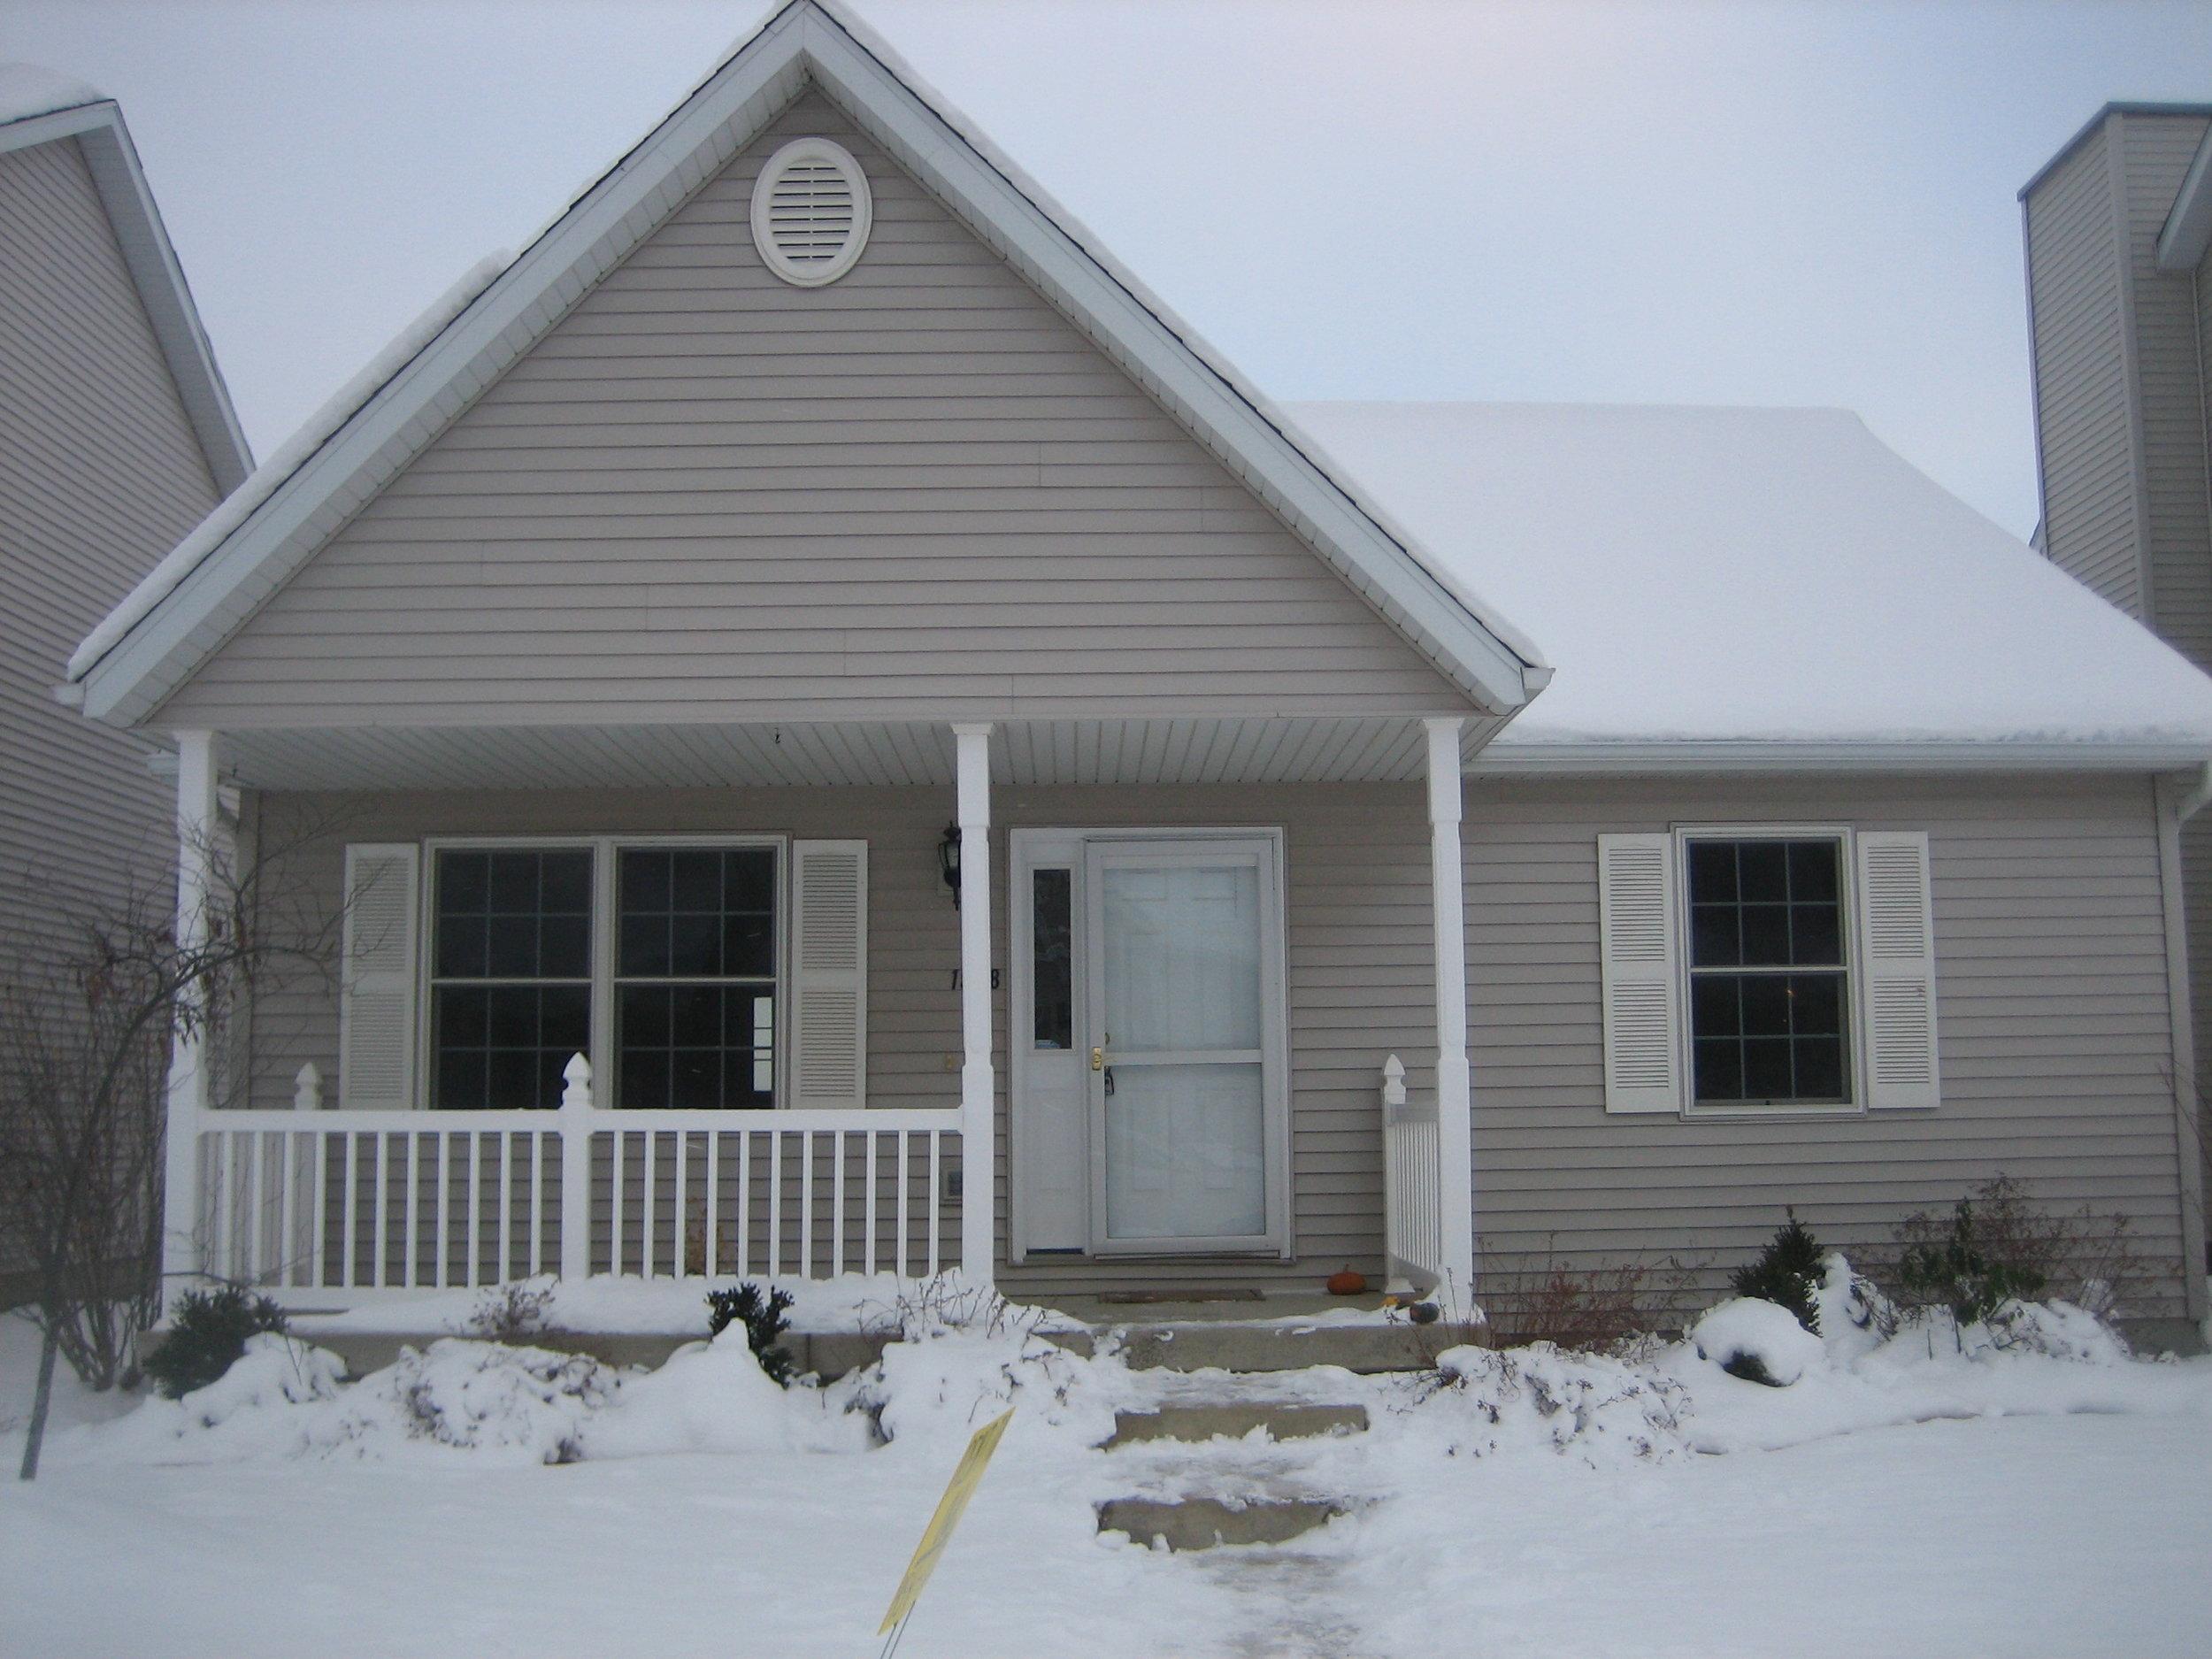 - 3 Bedroom, 1 Bath HouseUrbanaNewer home, full basement, 2 car garage